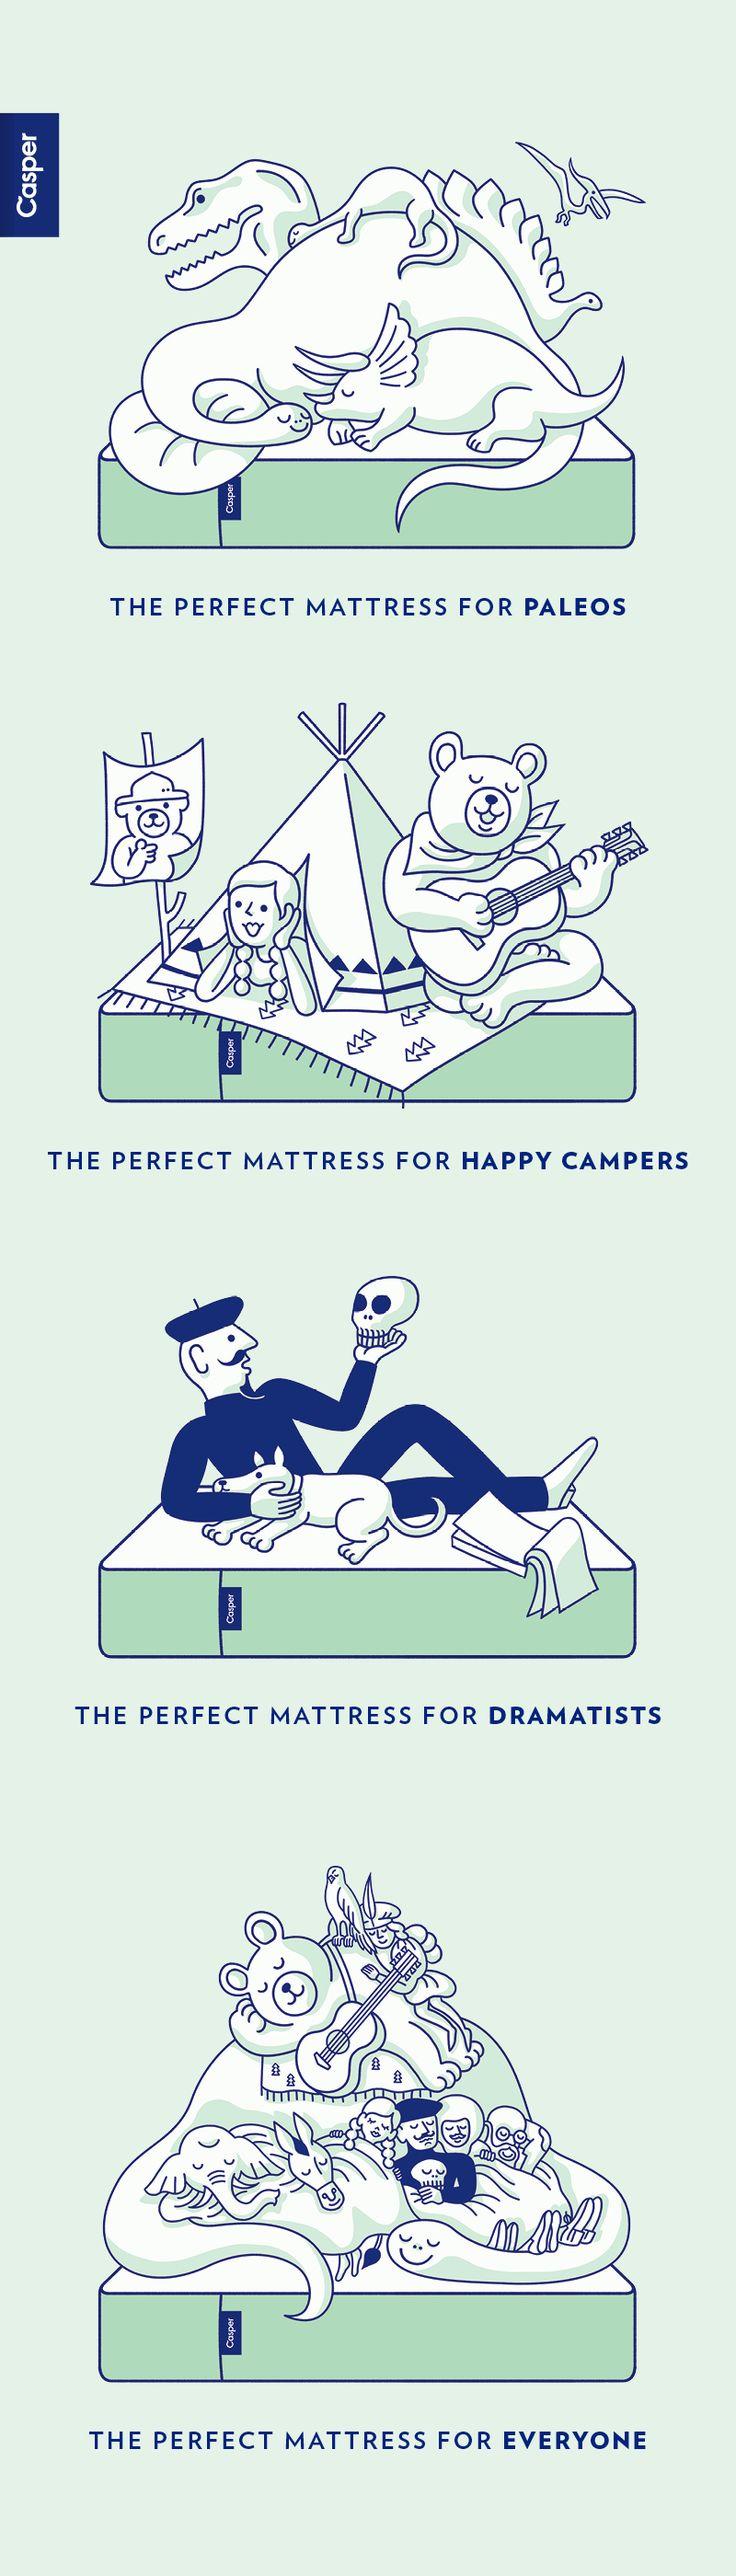 Tomi Um Illustrations, for Casper Created at Red Antler